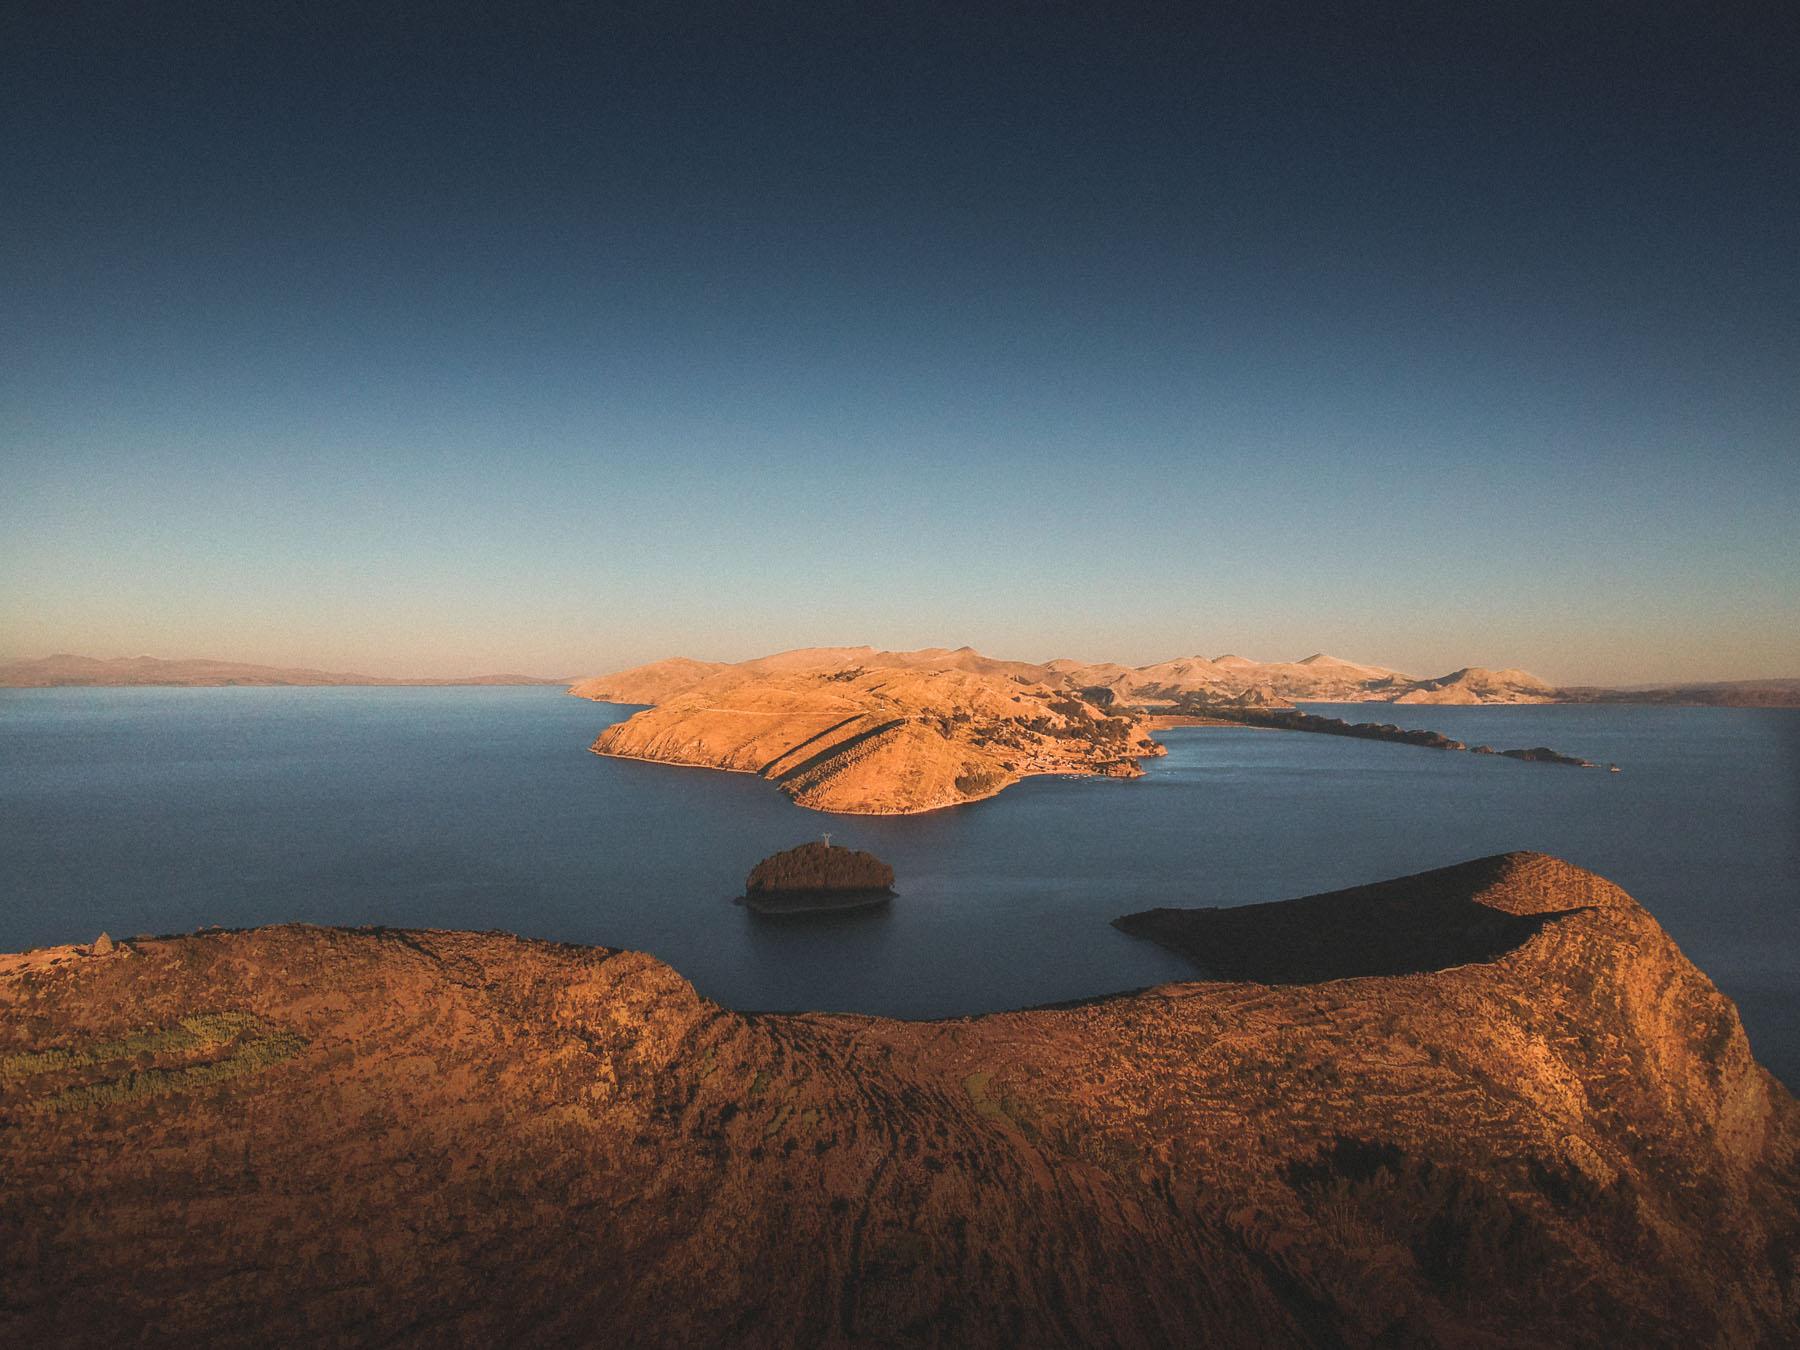 Views on Isla del sol